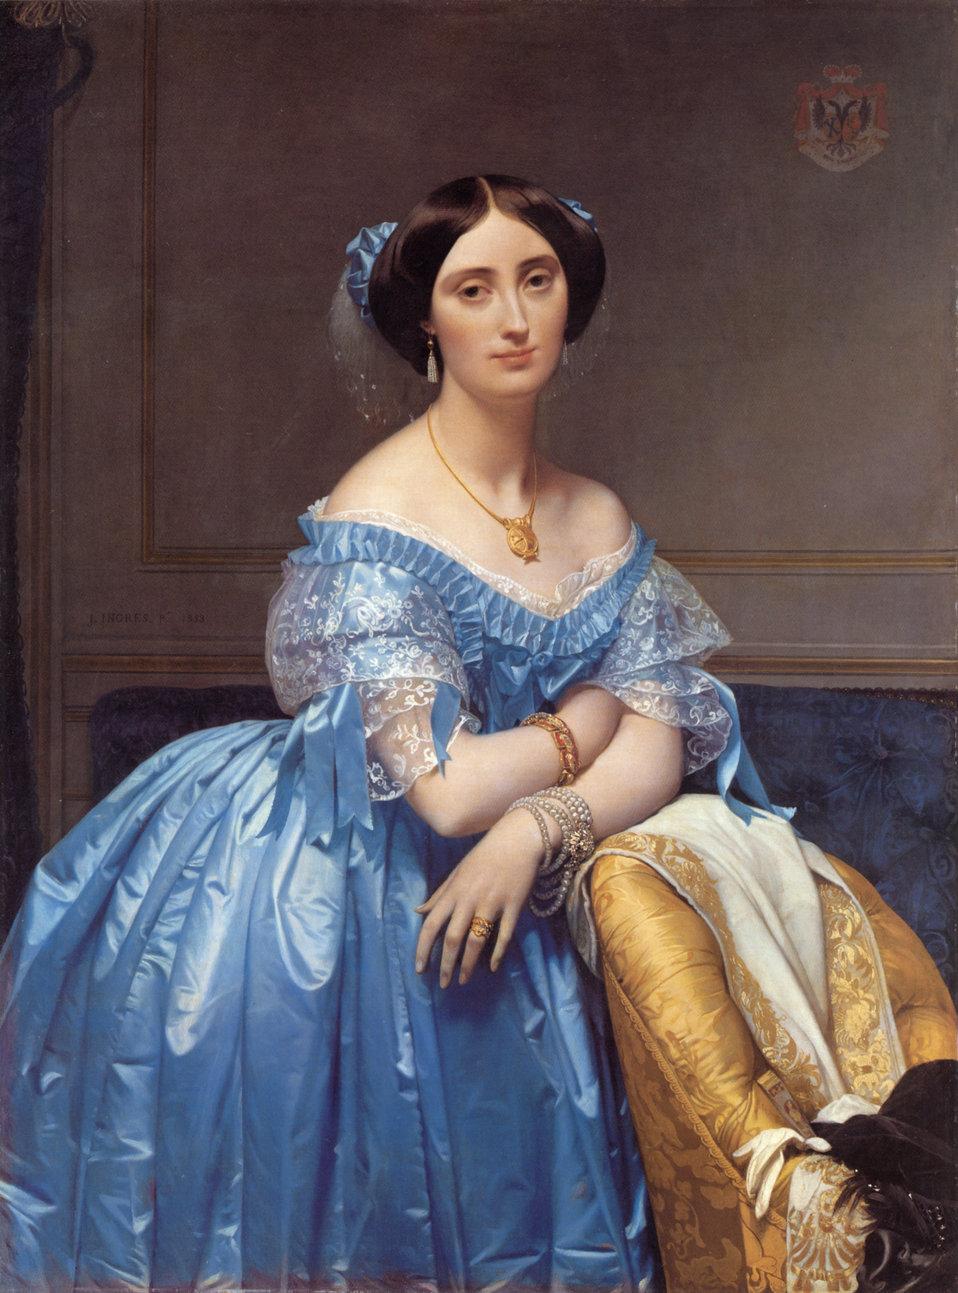 Jean auguste dominique ingres princesse albert de broglie.jpg